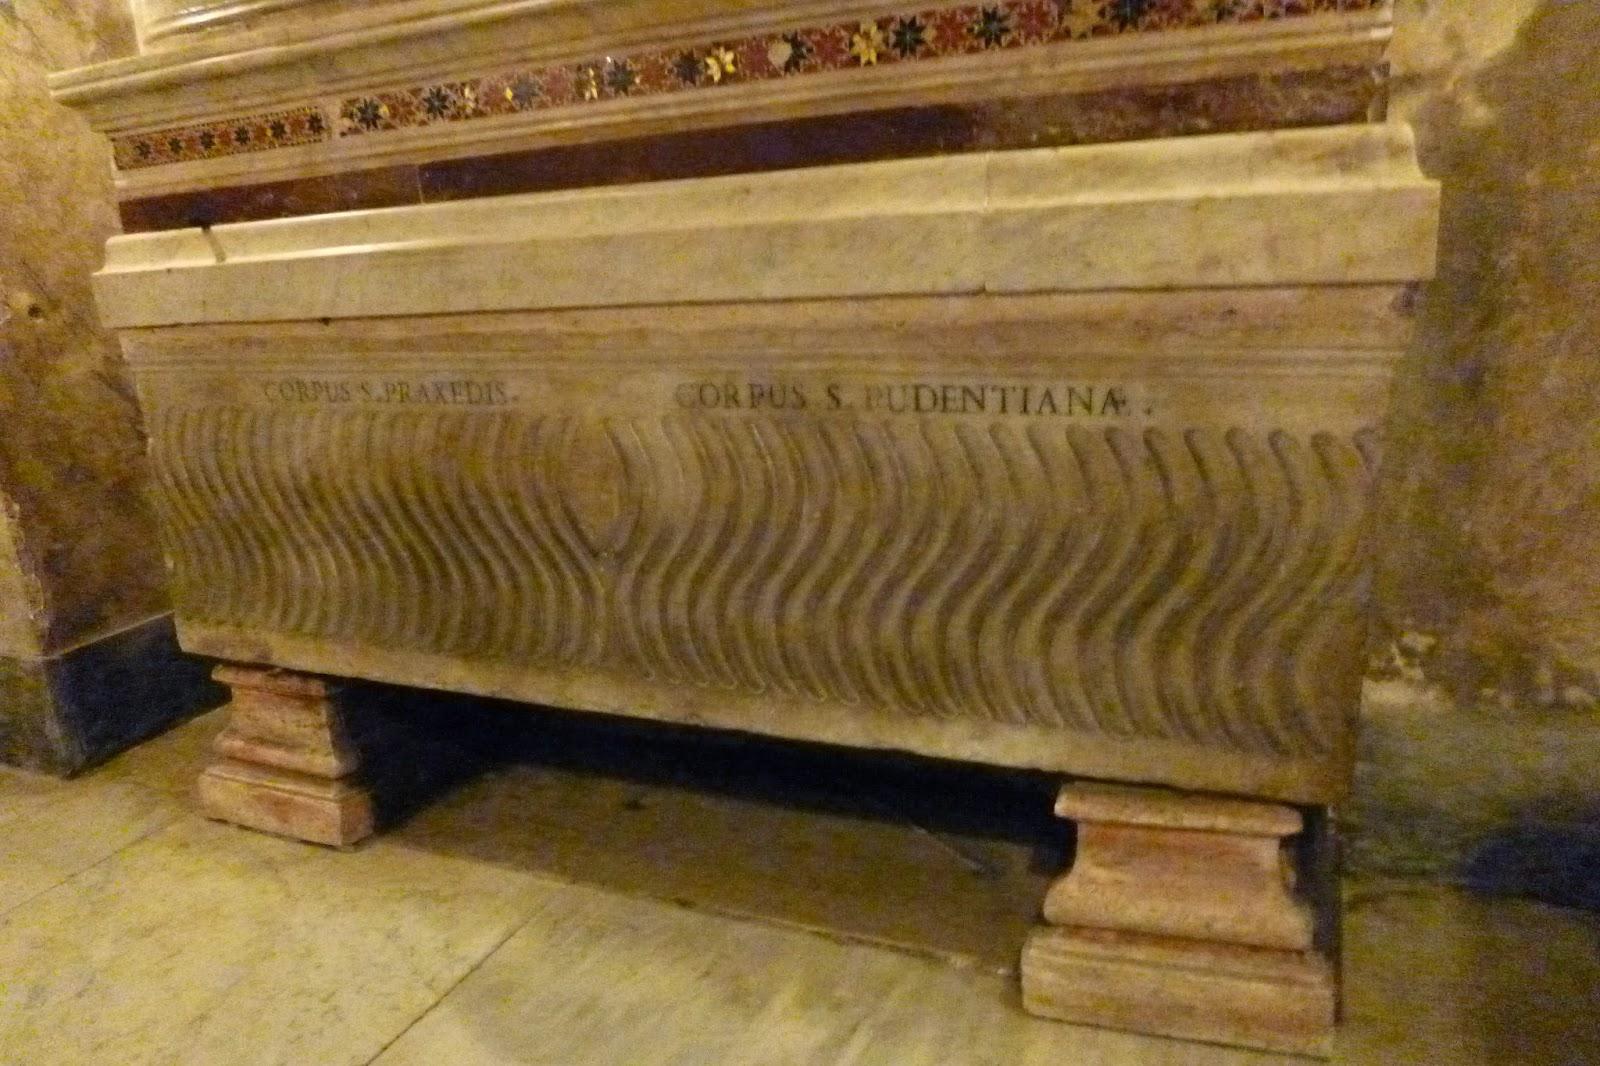 Igreja de Roma Santa Prassede, sarcófago romano